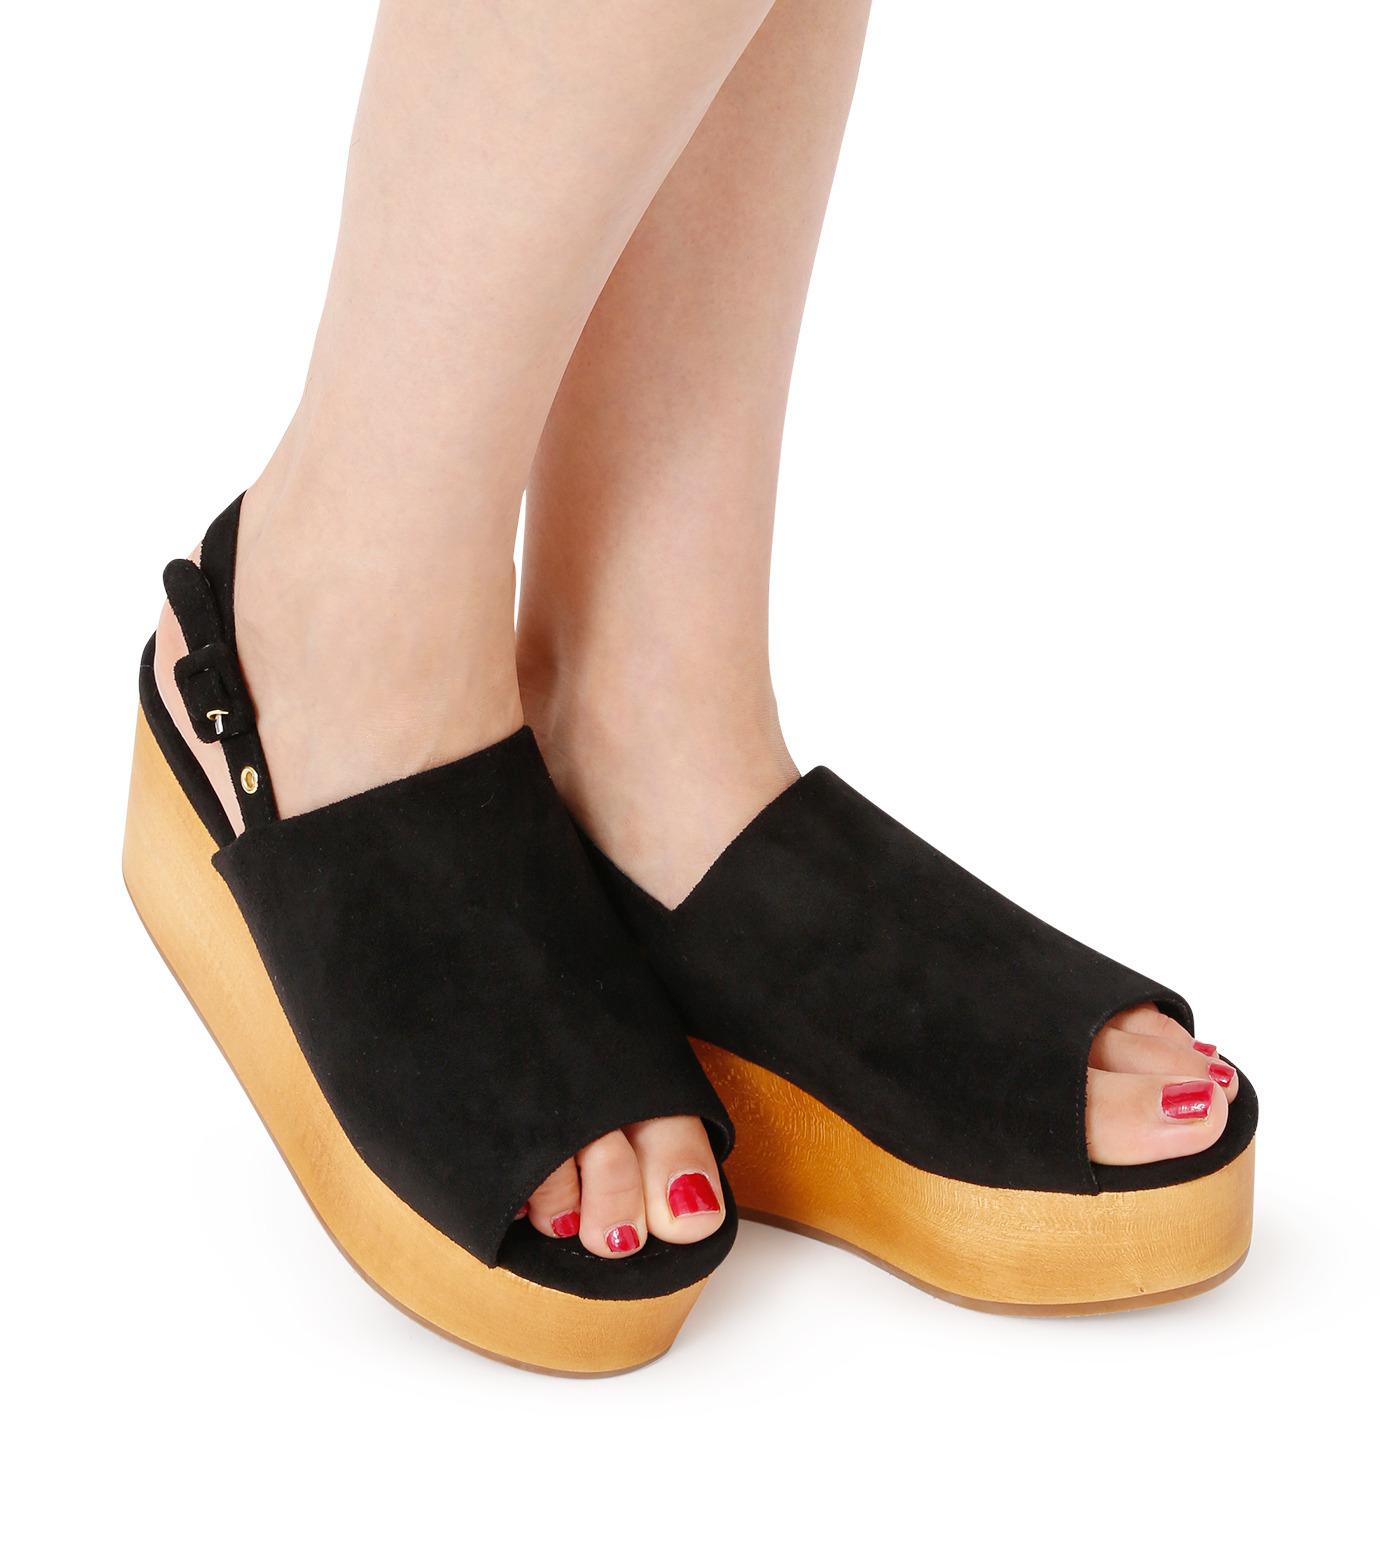 Myneself(マインセルフ)のFake Suede Sandal-BLACK(フラットシューズ/Flat shoes)-MSS7-0010-13 拡大詳細画像5